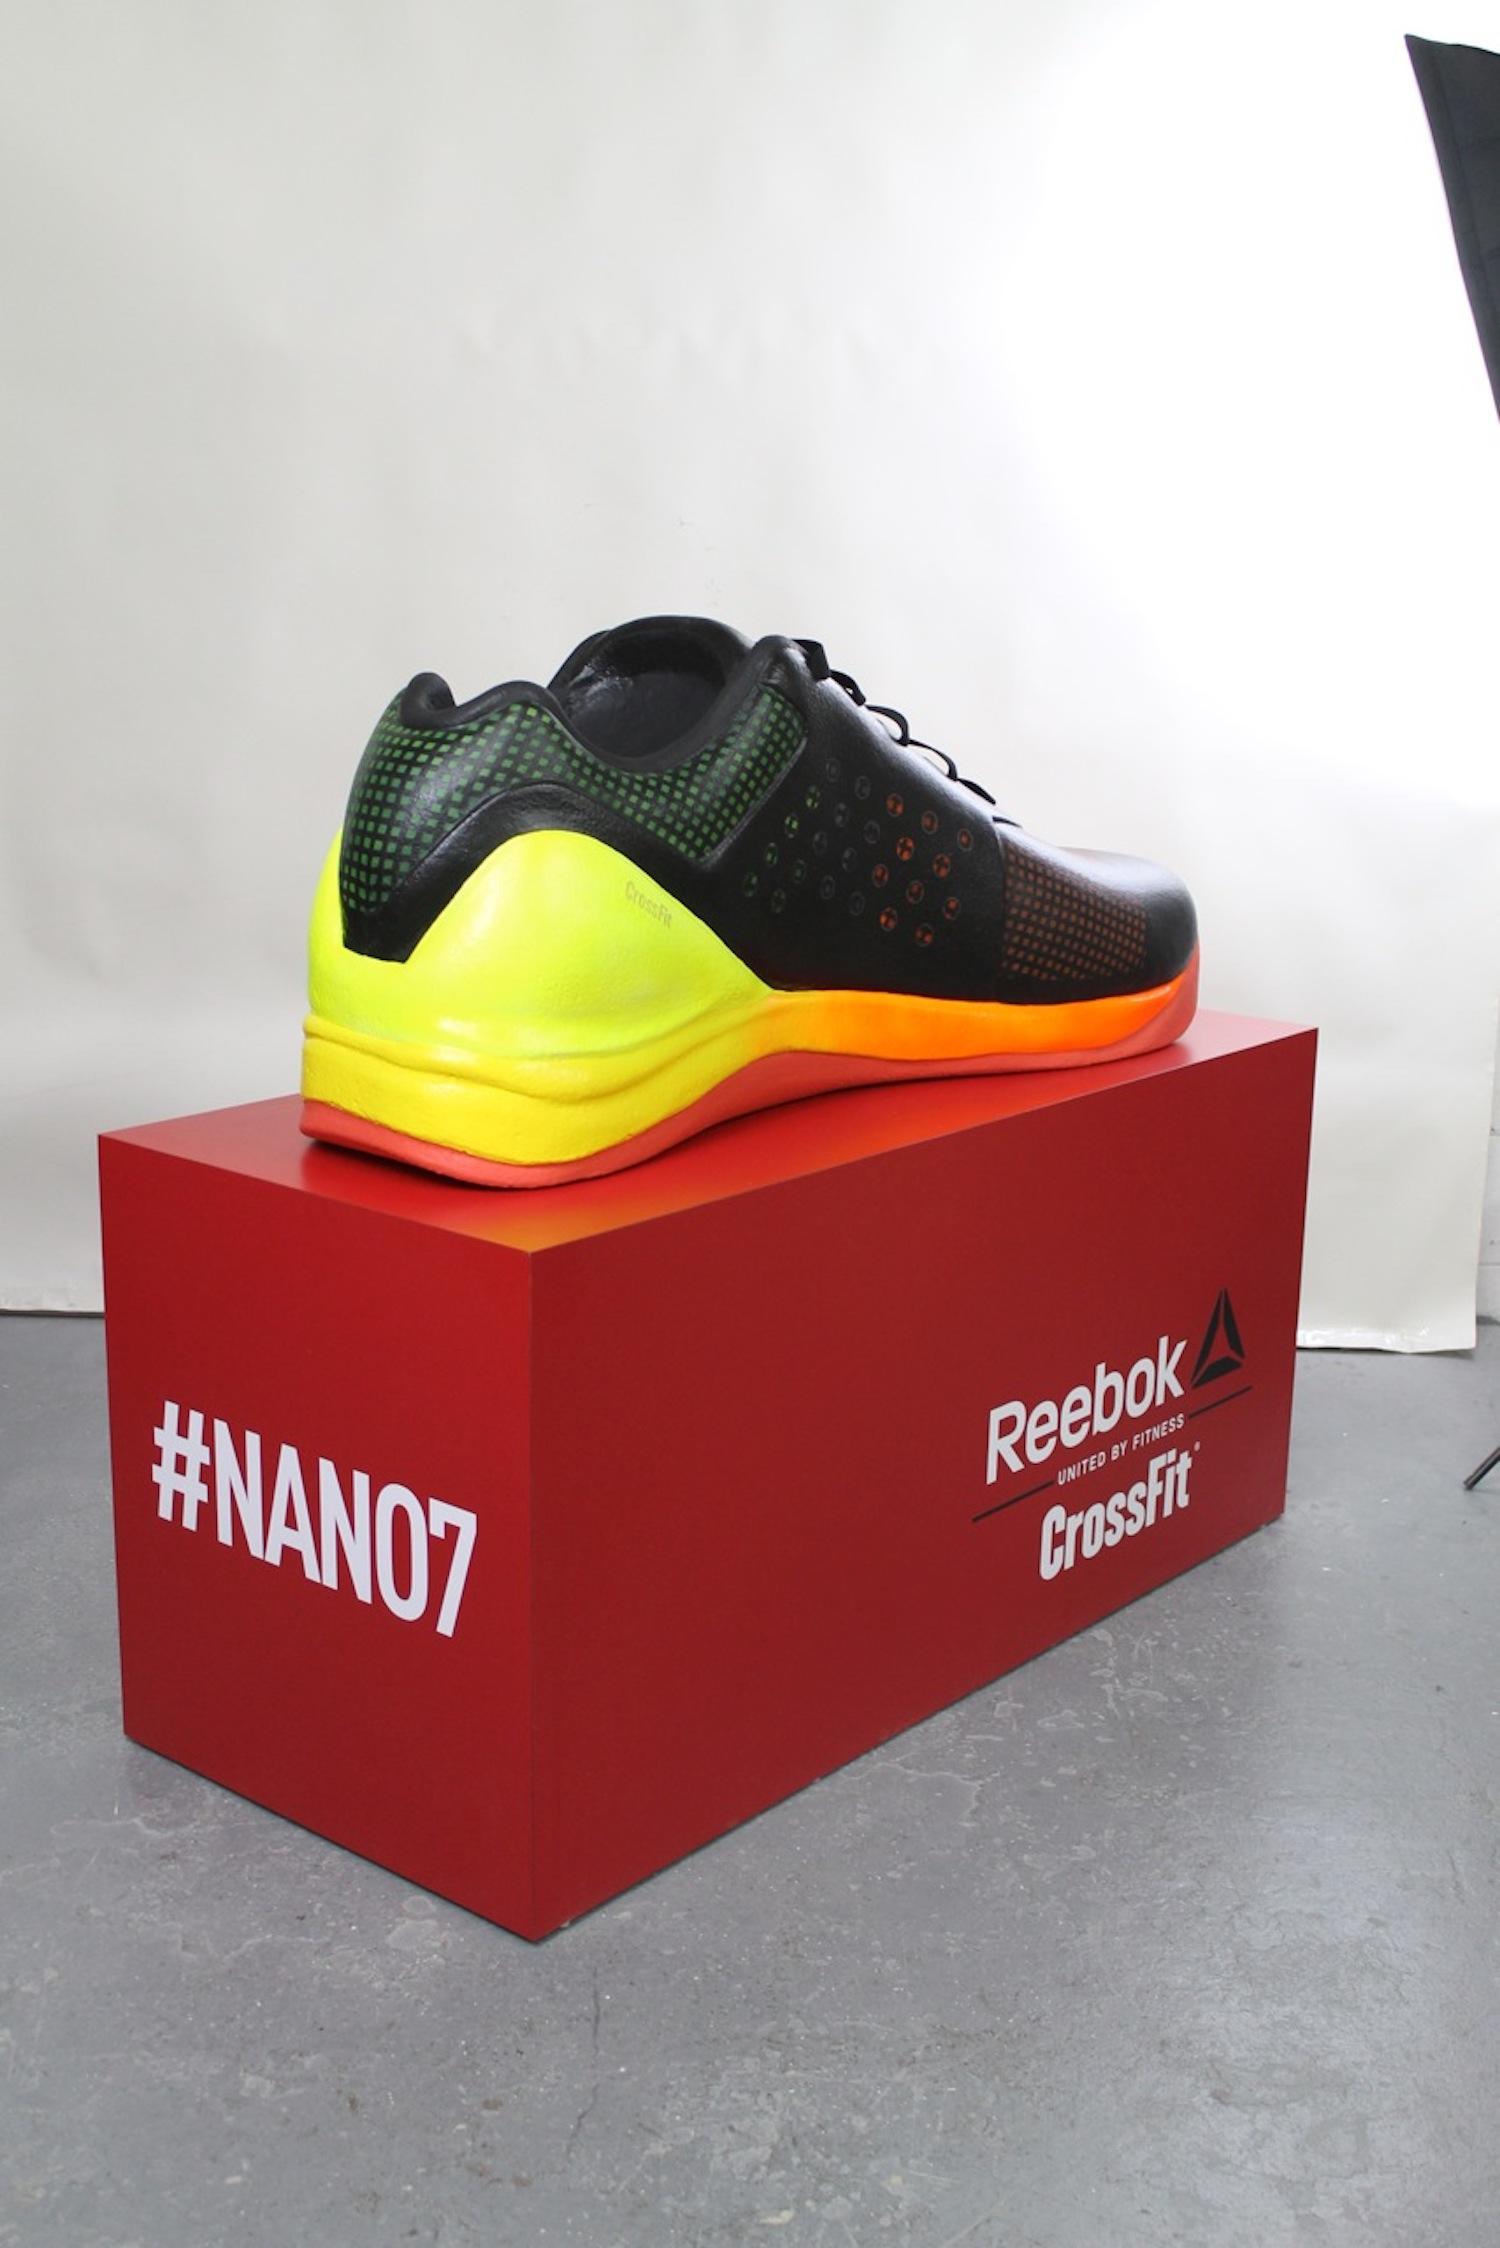 Reebok Crossfit Nano 7 Launch